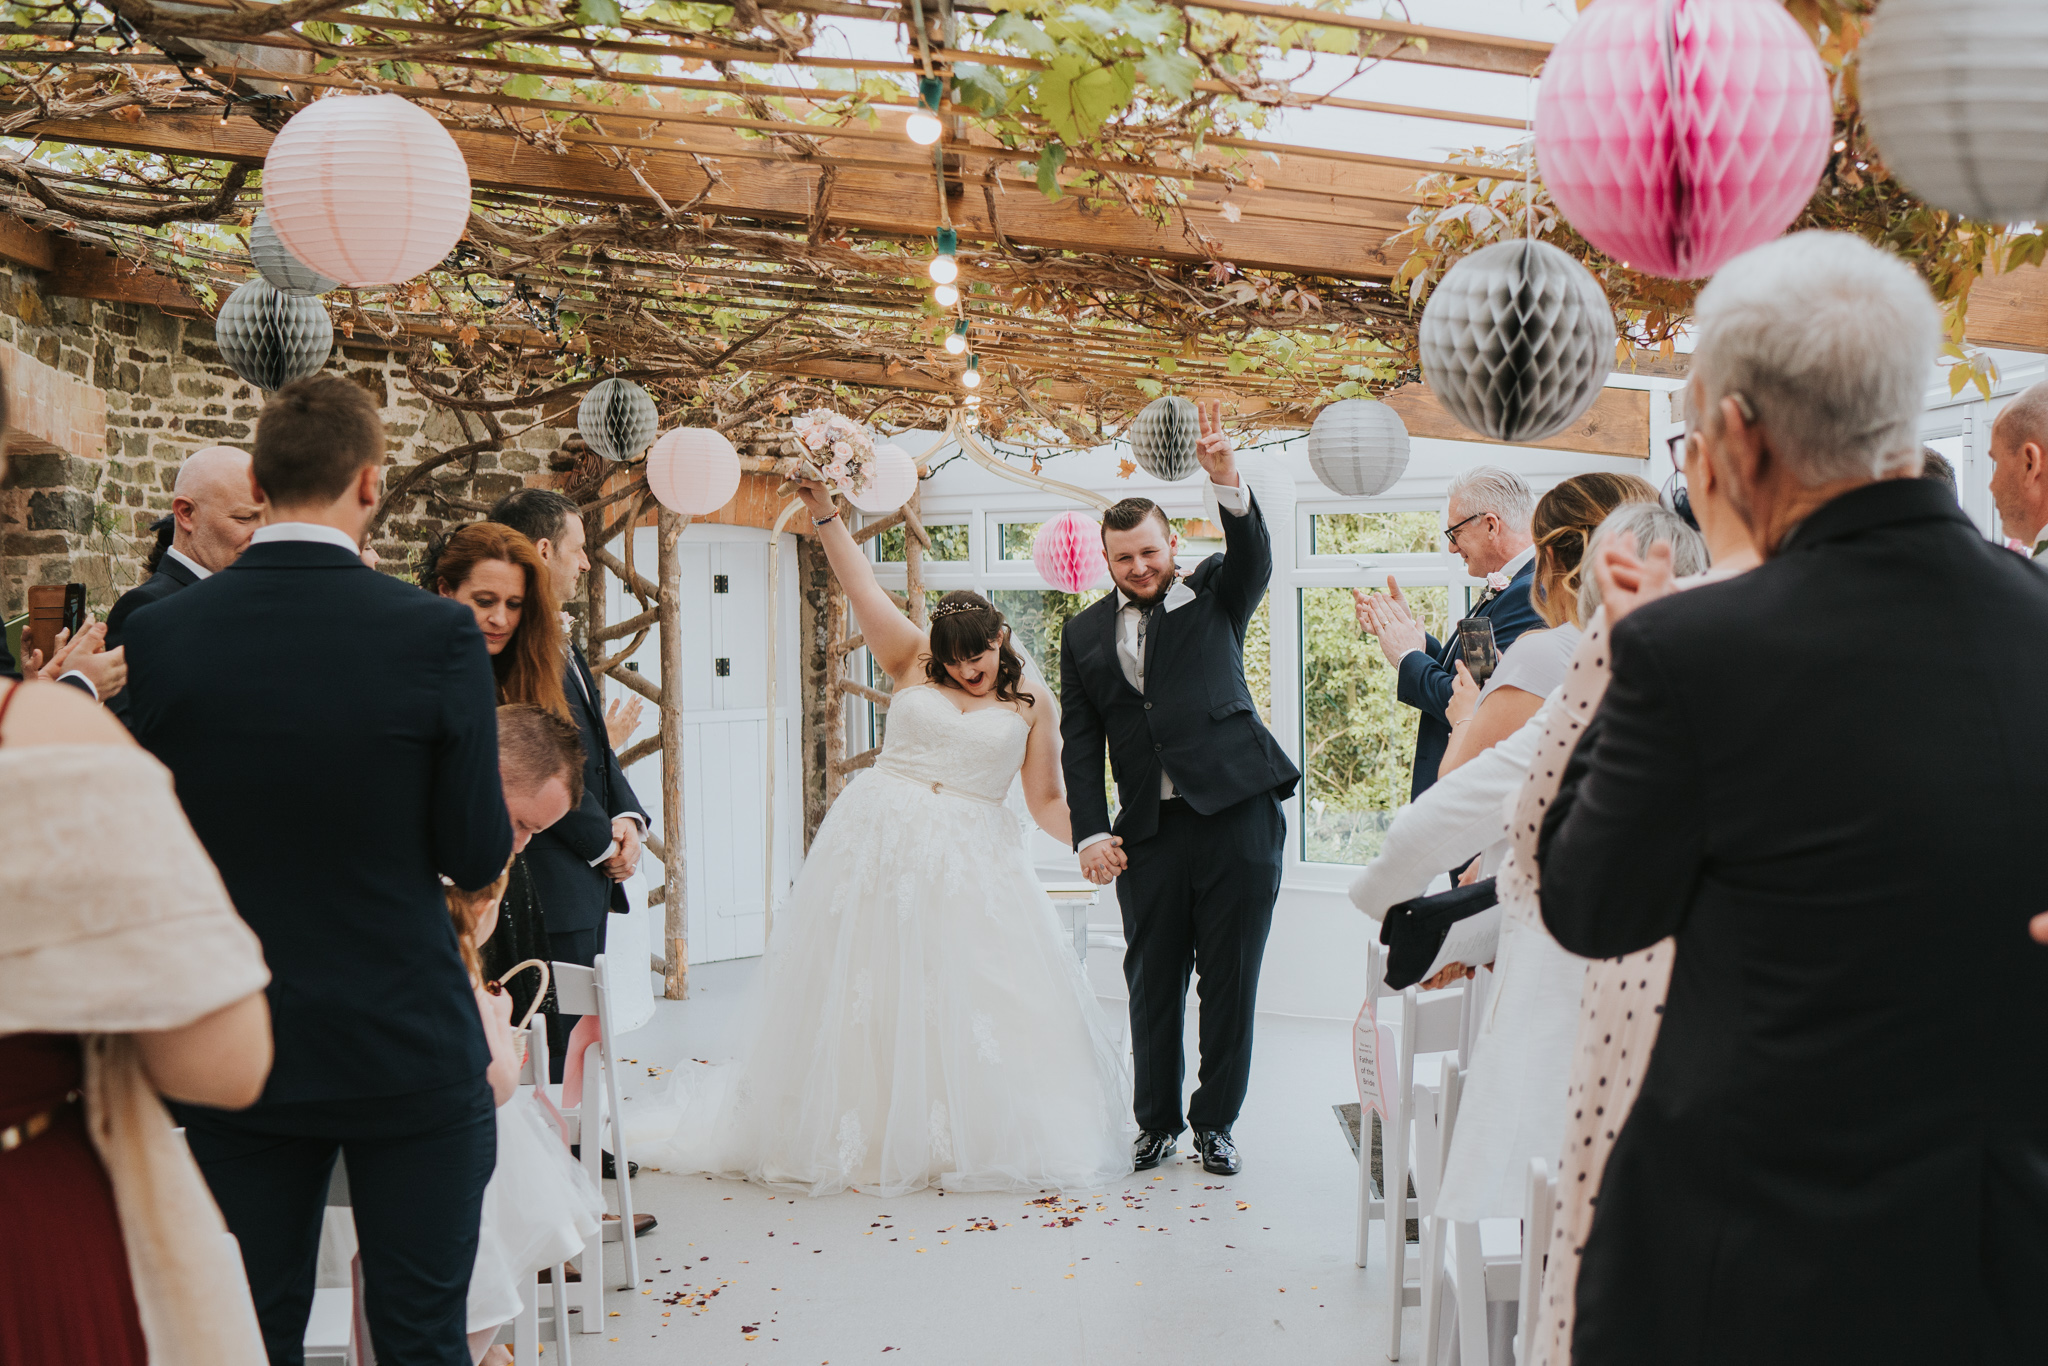 grace-sam-old-barn-clovelly-devon-wedding-photographer-grace-elizabeth-essex-suffolk-norfolk-wedding-photographer (66 of 132).jpg